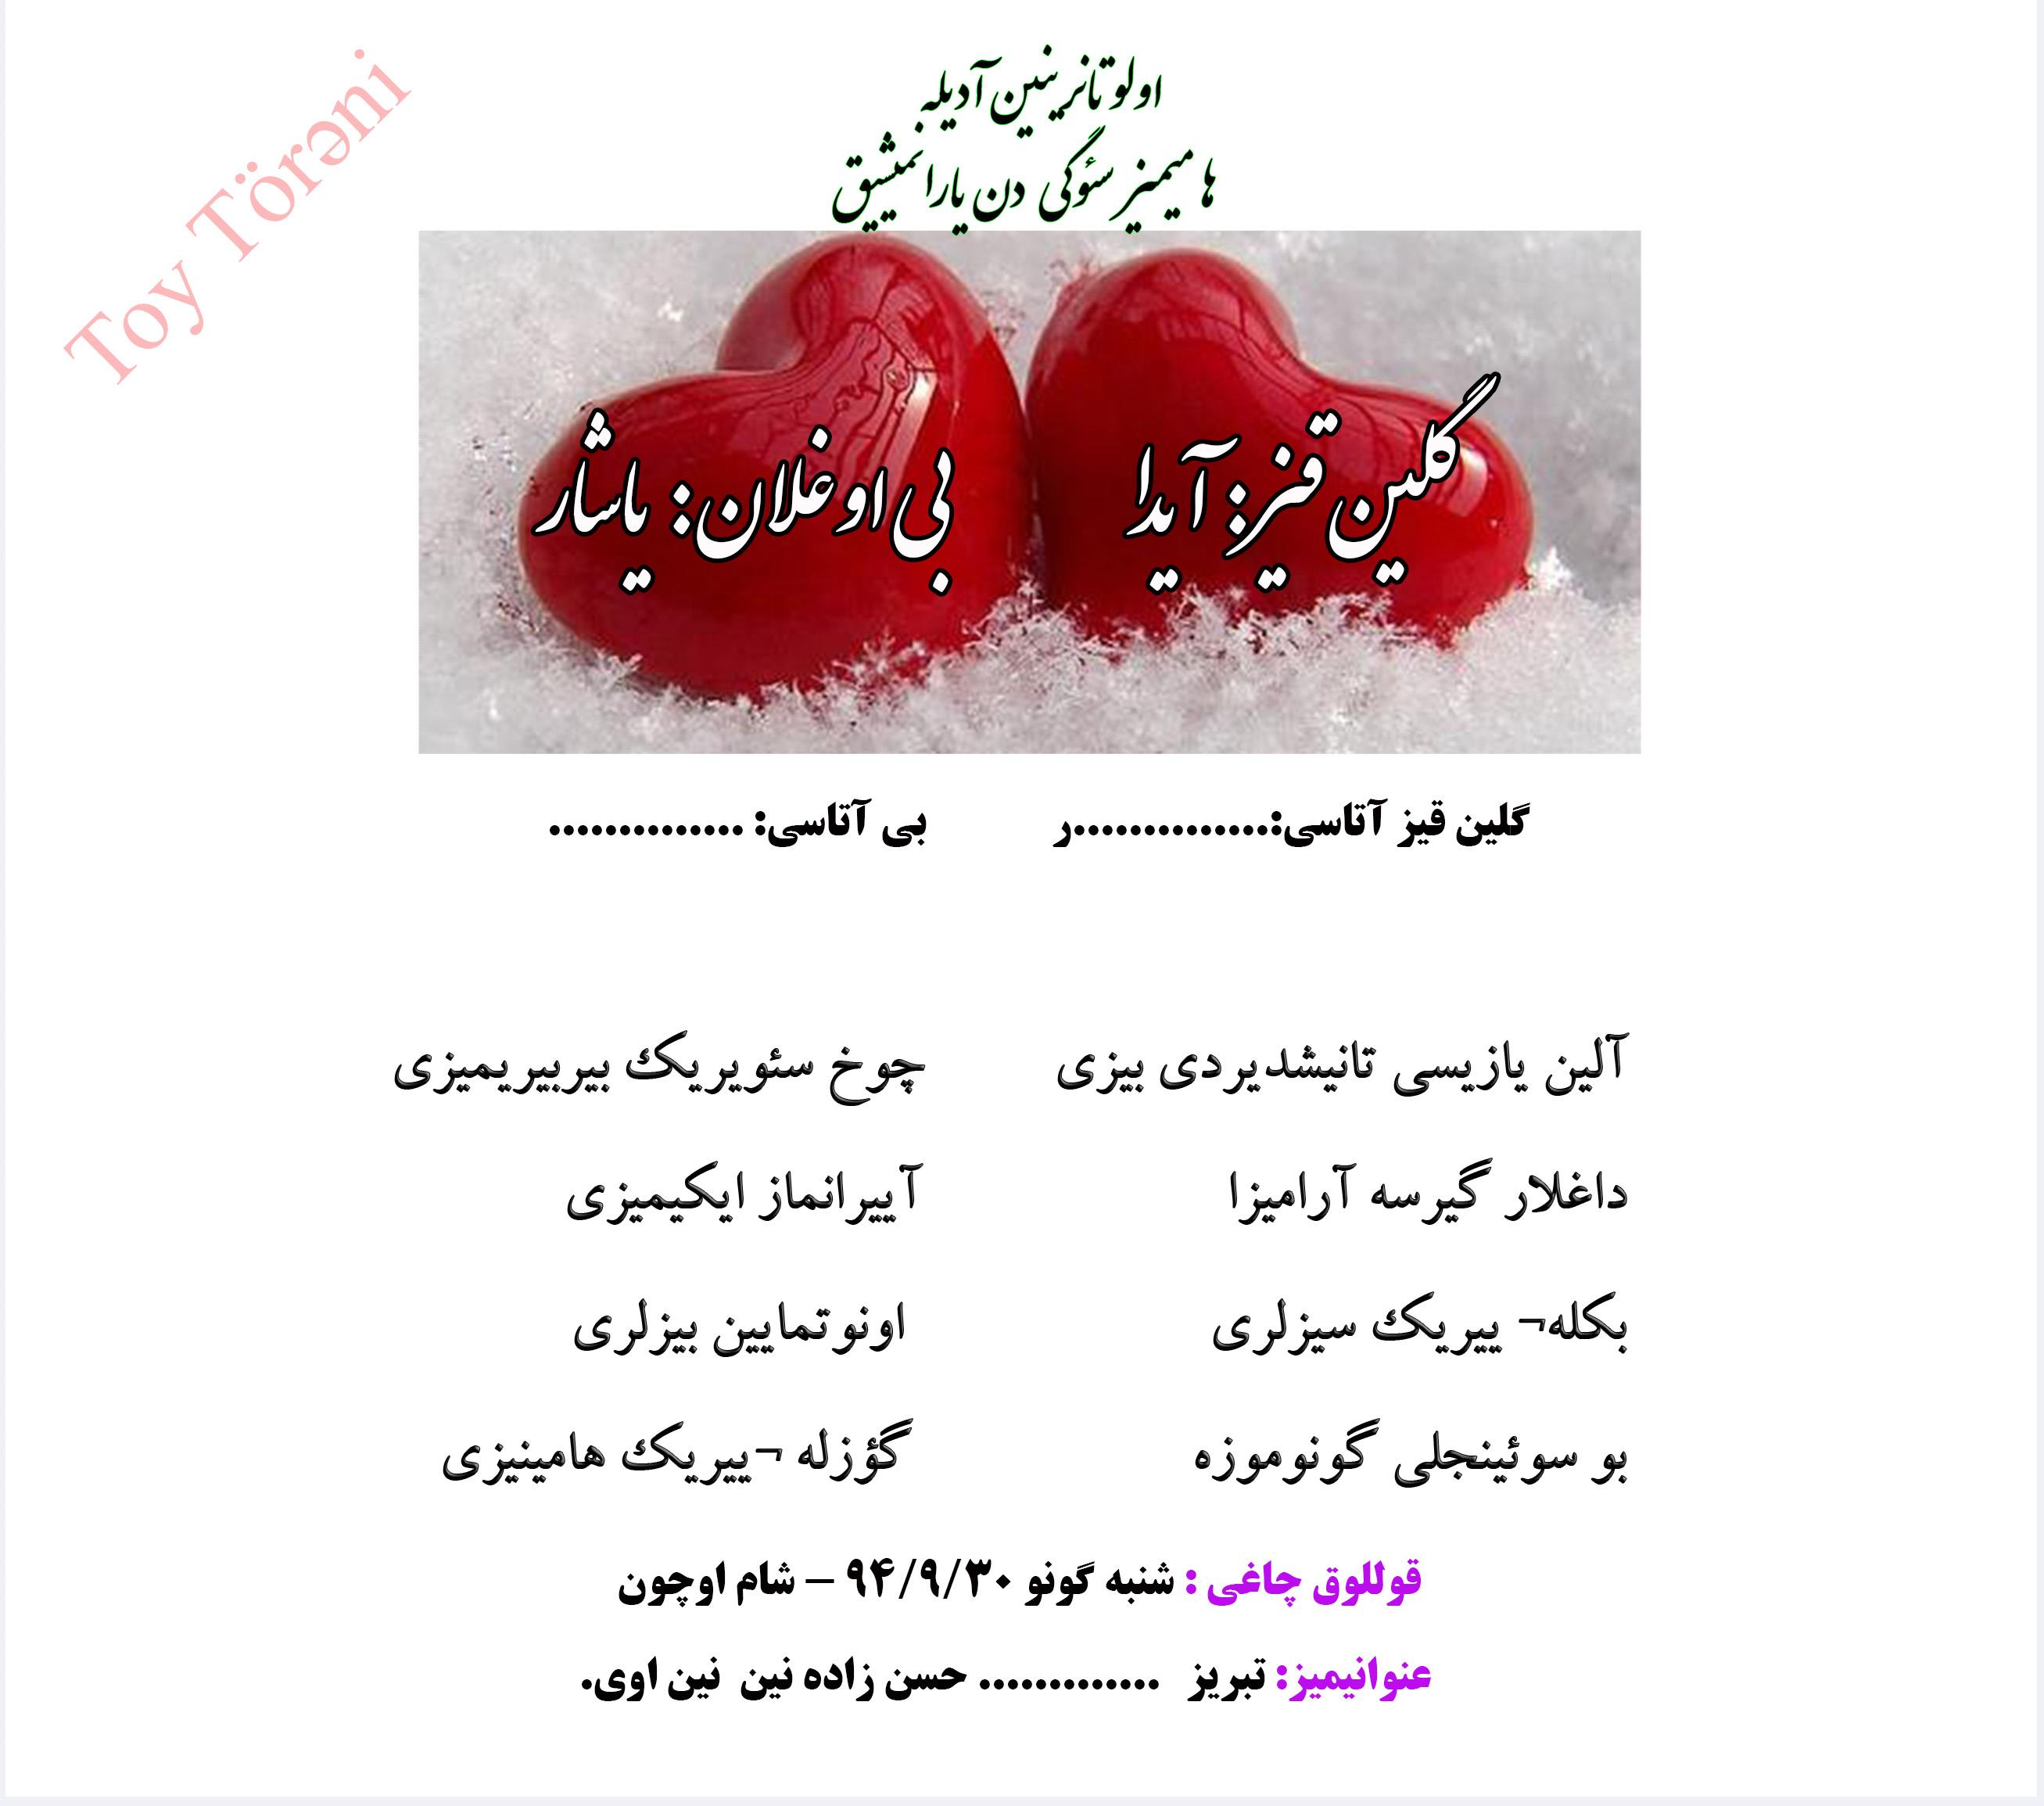 http://s3.picofile.com/file/8228988642/1.jpg